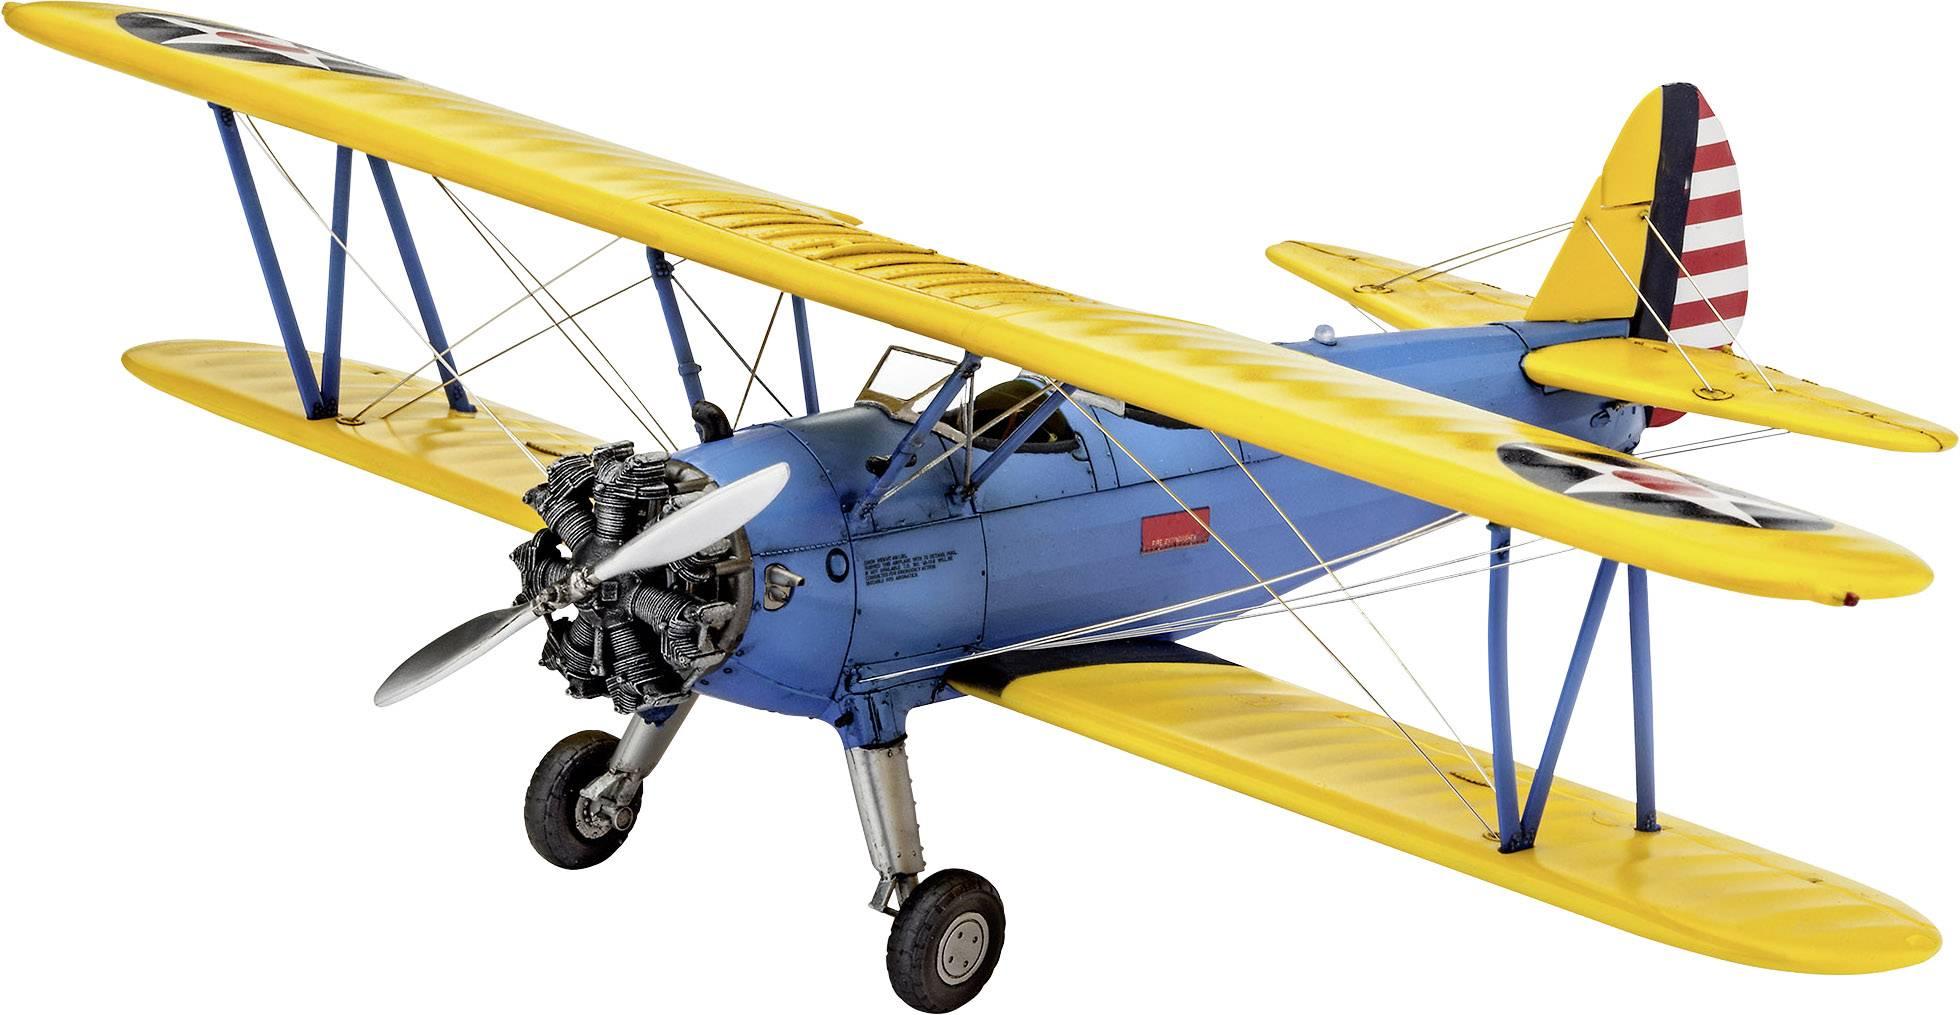 Model letadla, stavebnice Revell 03957 Stearman PT-17 Kaydet Stearman PT-17 Kaydet 03957 1:48